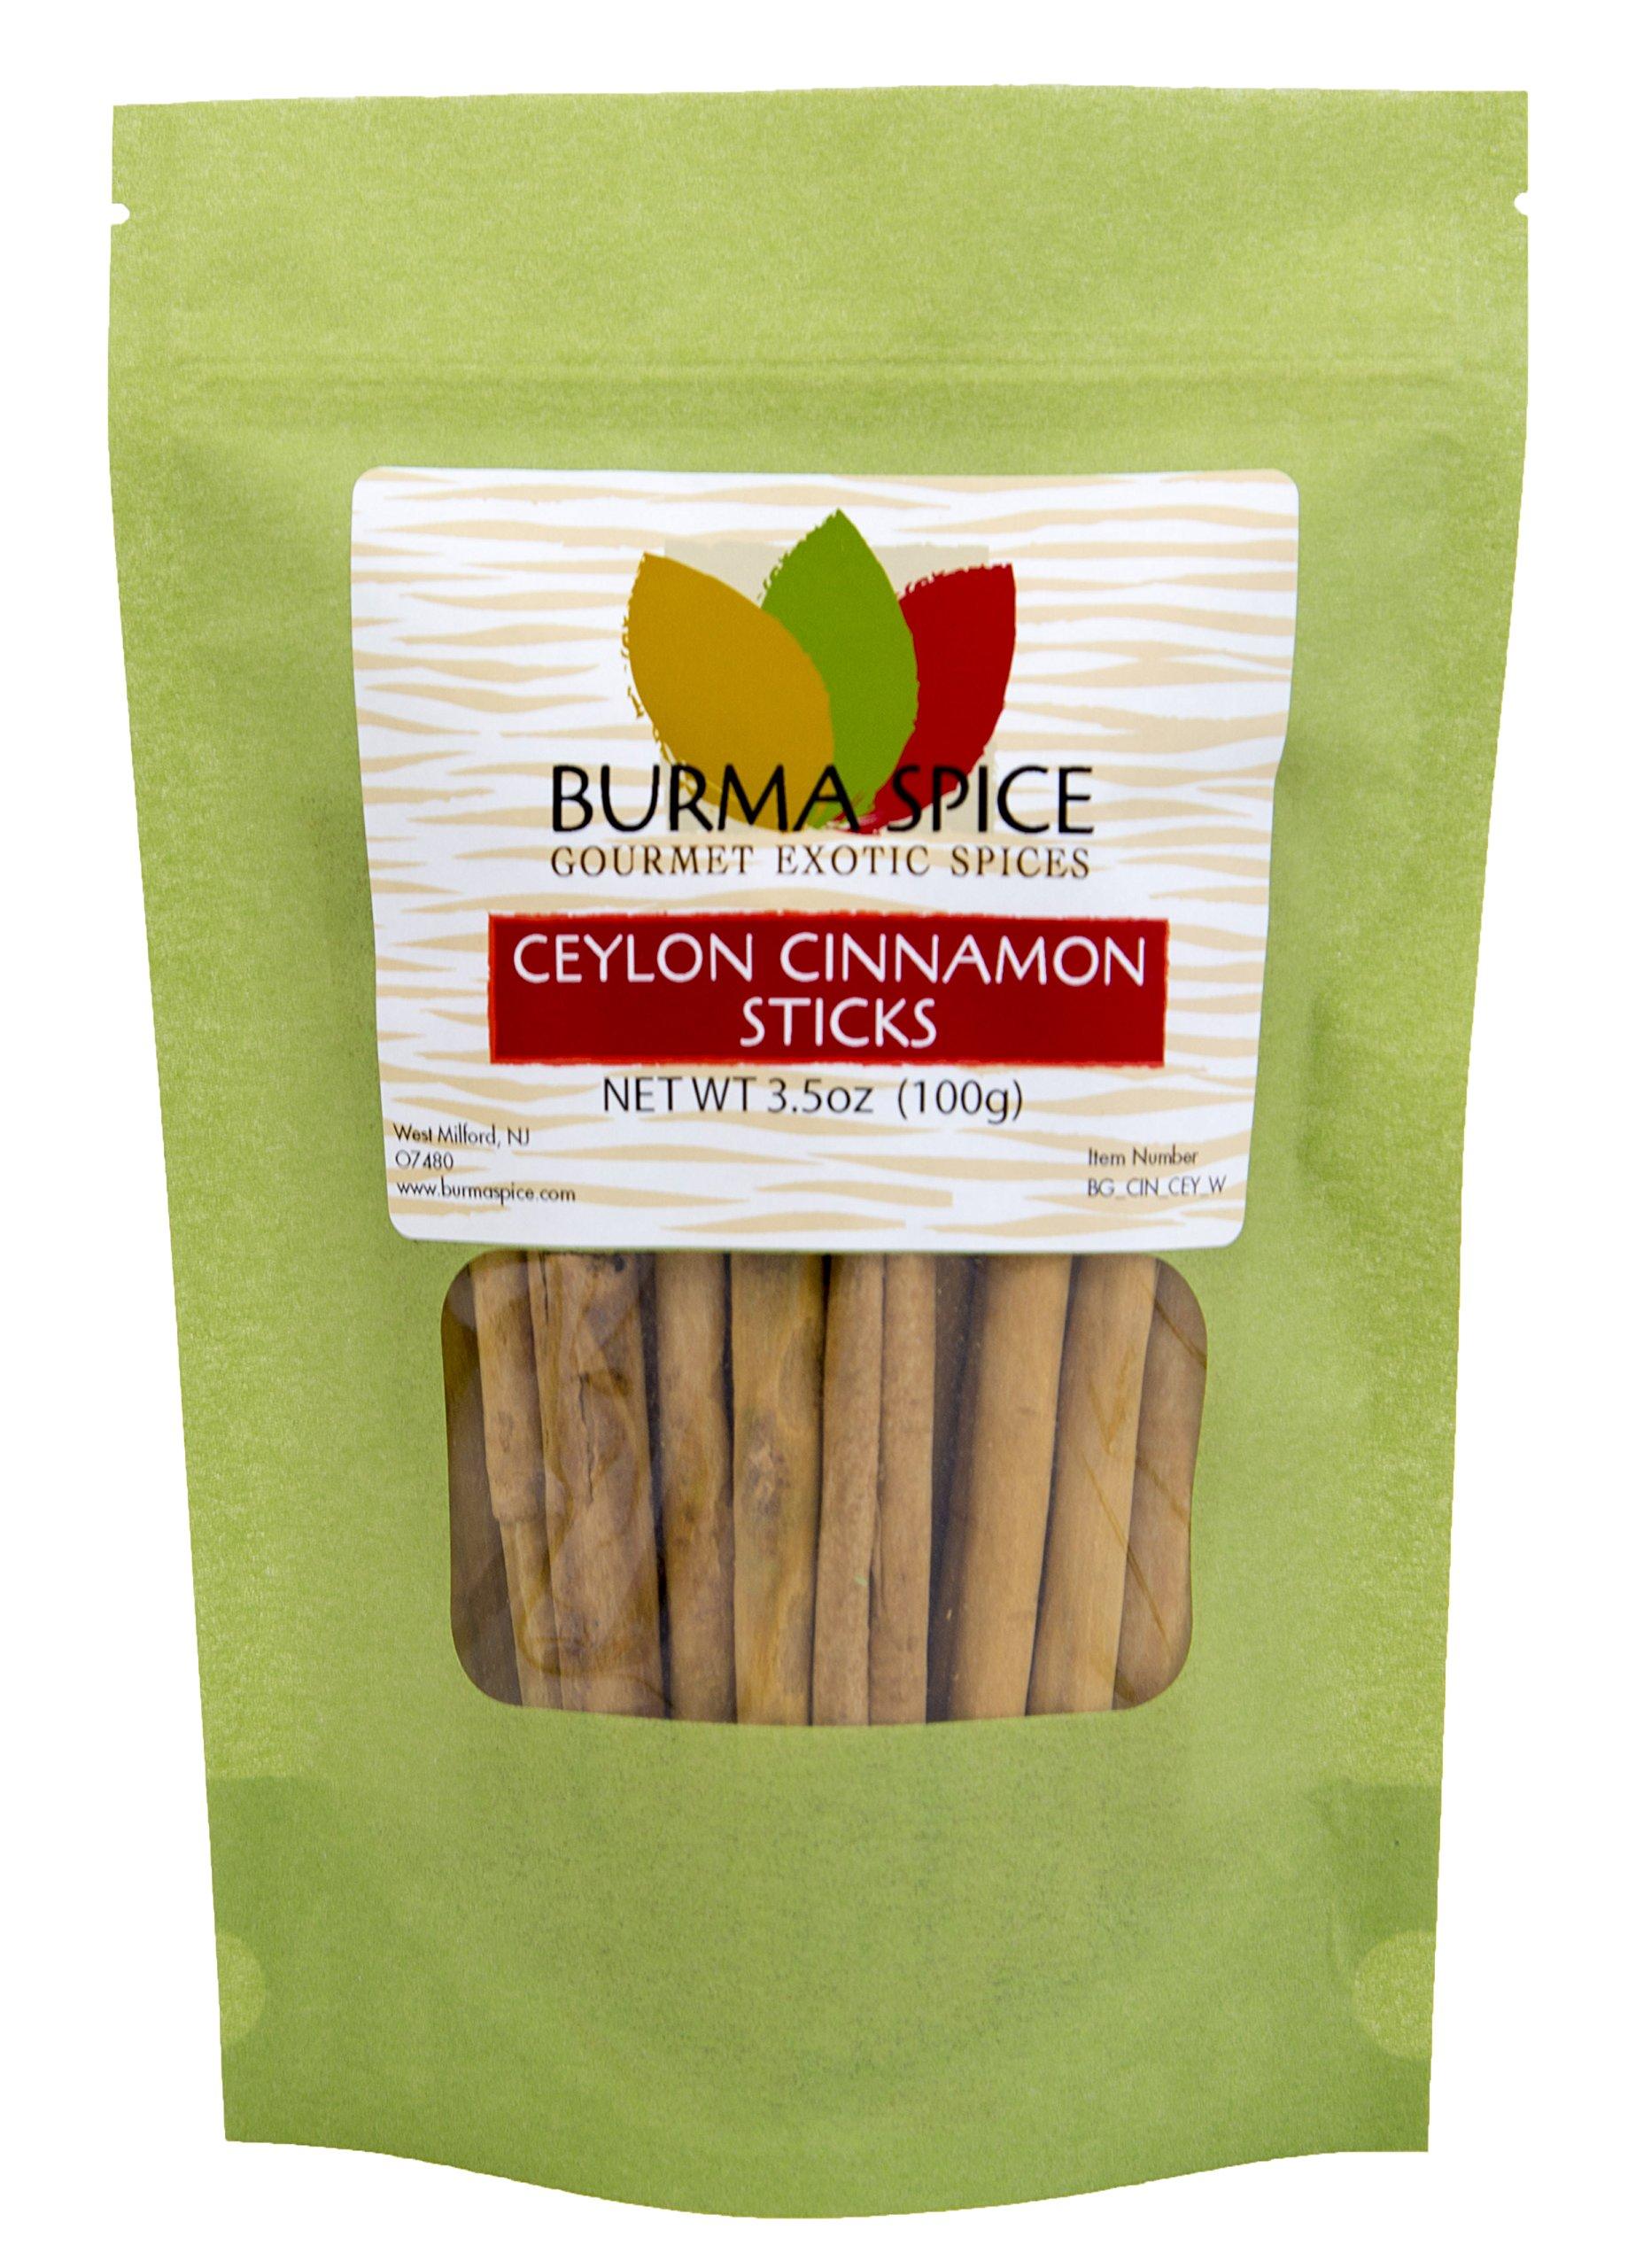 Ceylon Cinnamon Sticks (3.5oz.) by Burma Spice (Image #1)